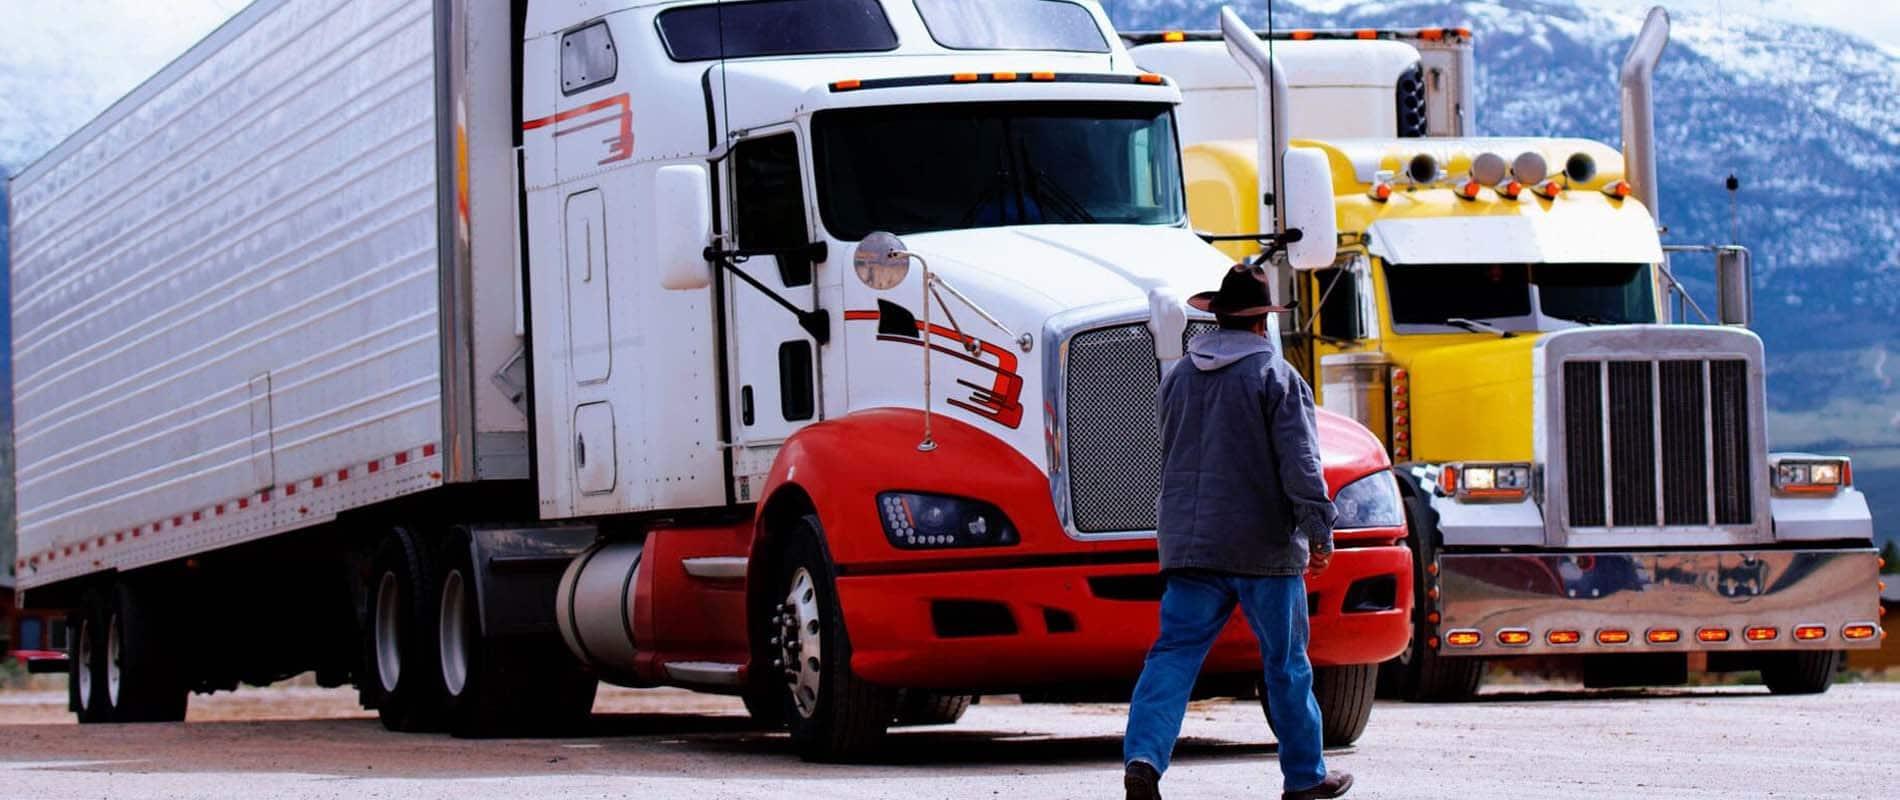 MCALLEN TRUCK DRIVER ACCIDENT